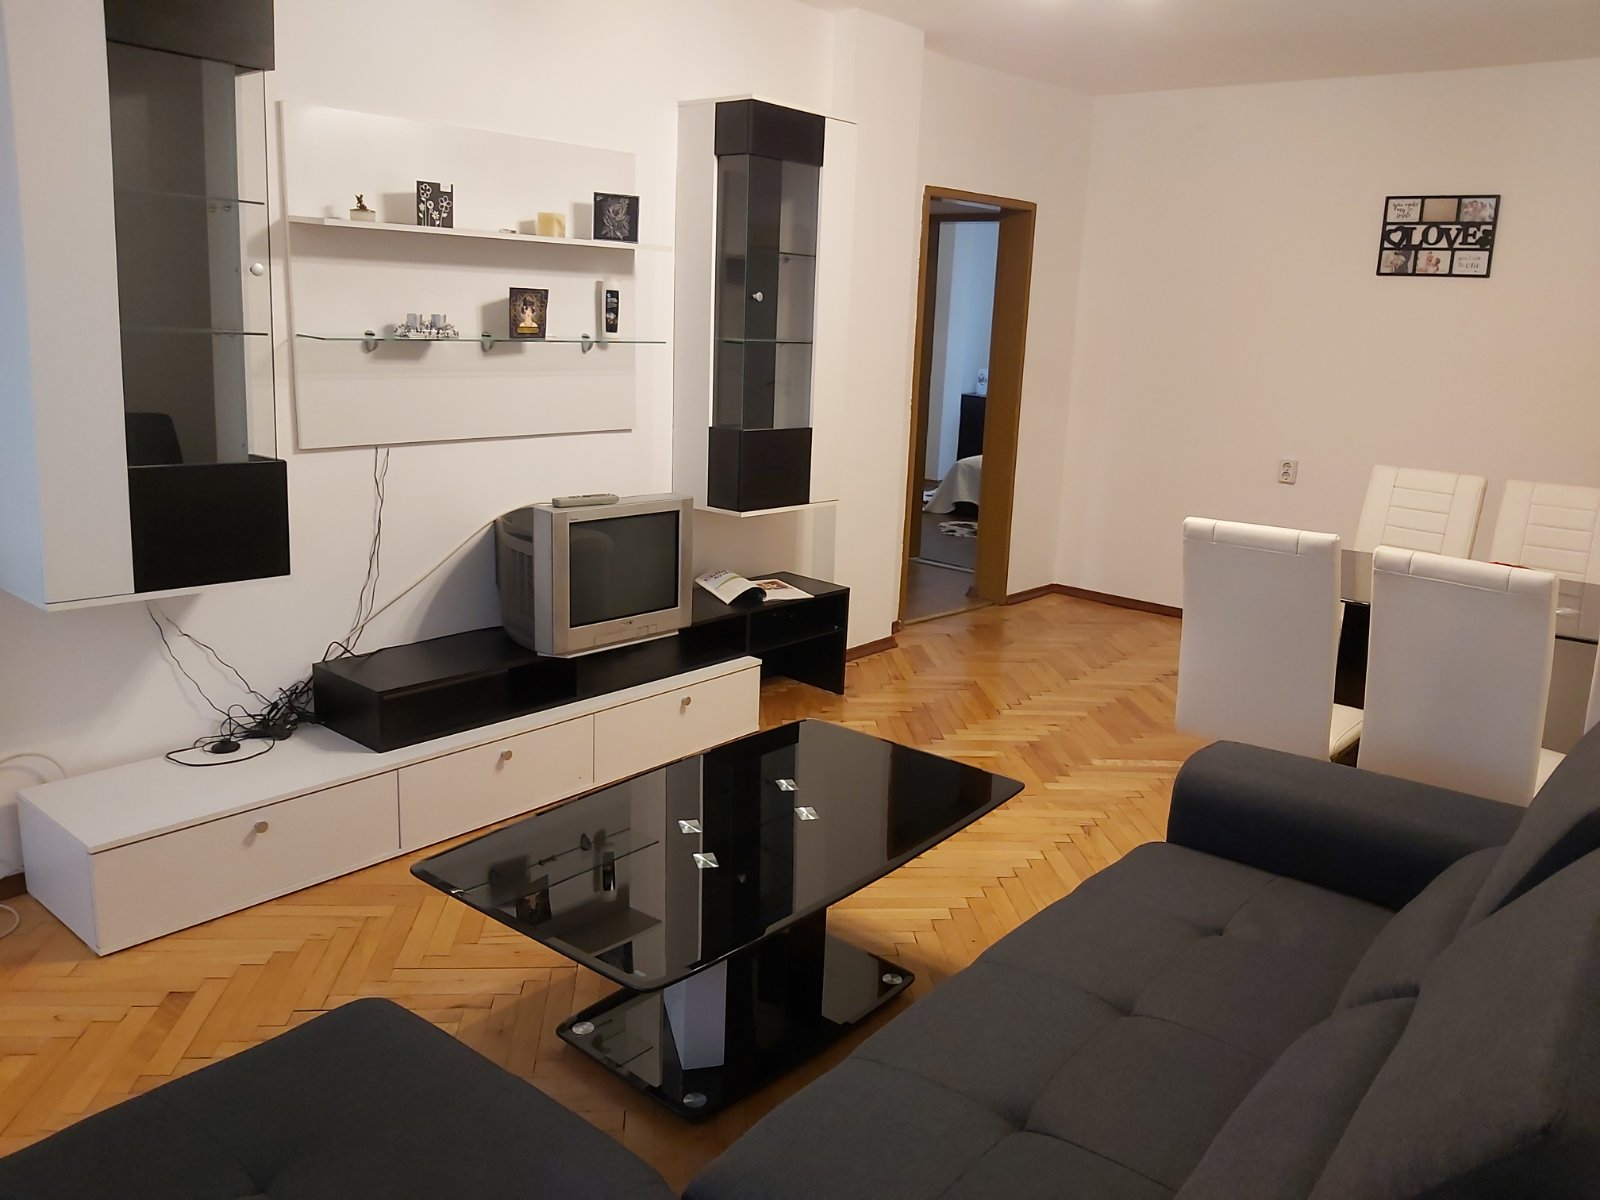 Четиристаен апартамент в кв. Люлин, 93 кв.м.